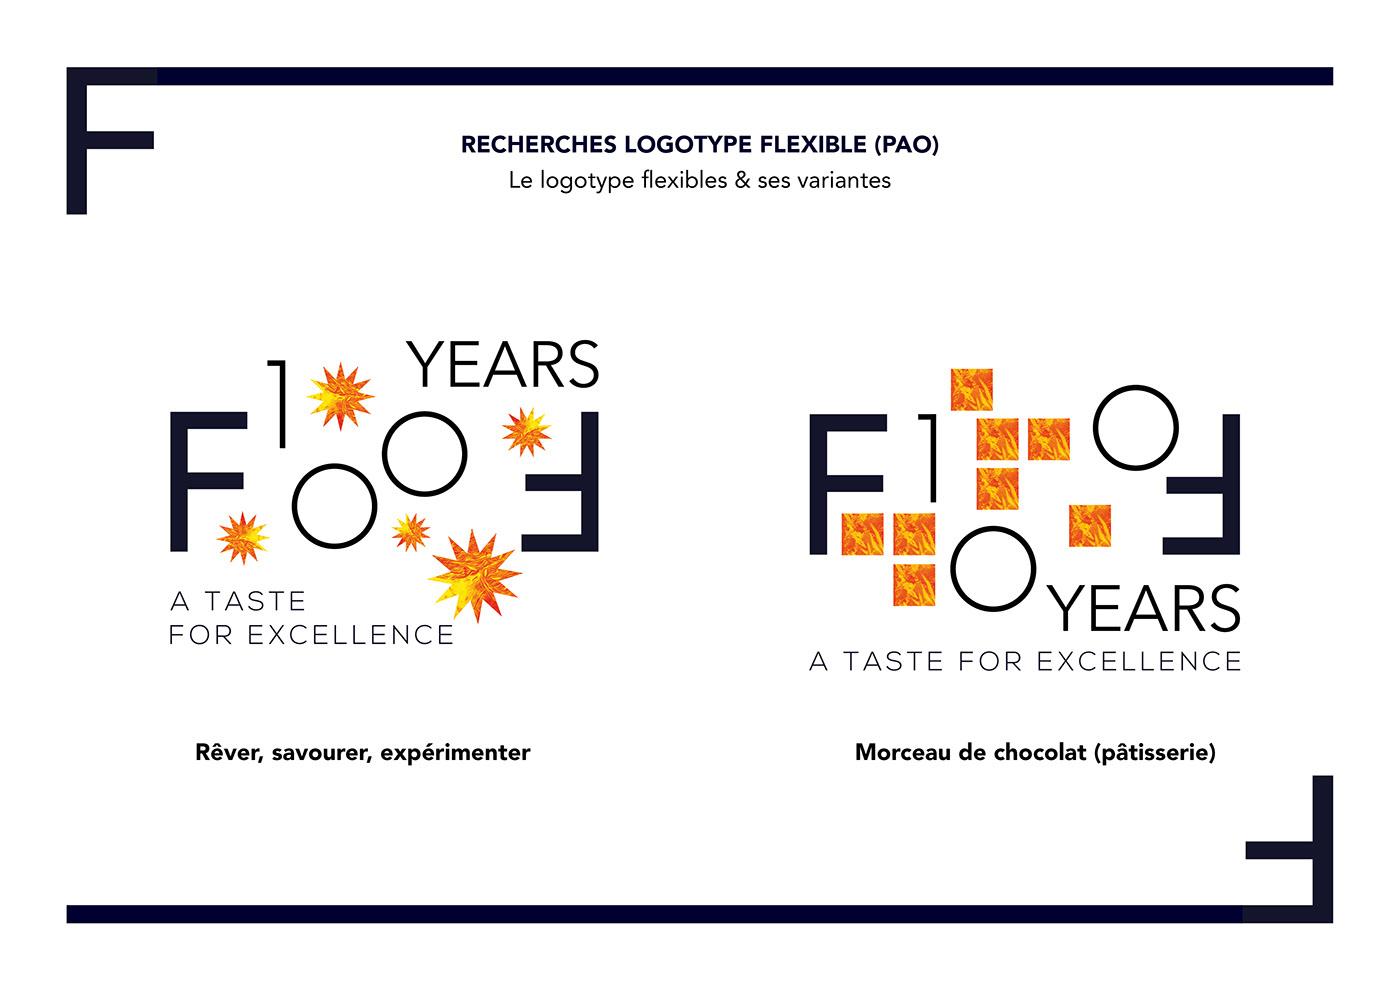 ferrandi flexible gastronomie Logotype prestige Typographie